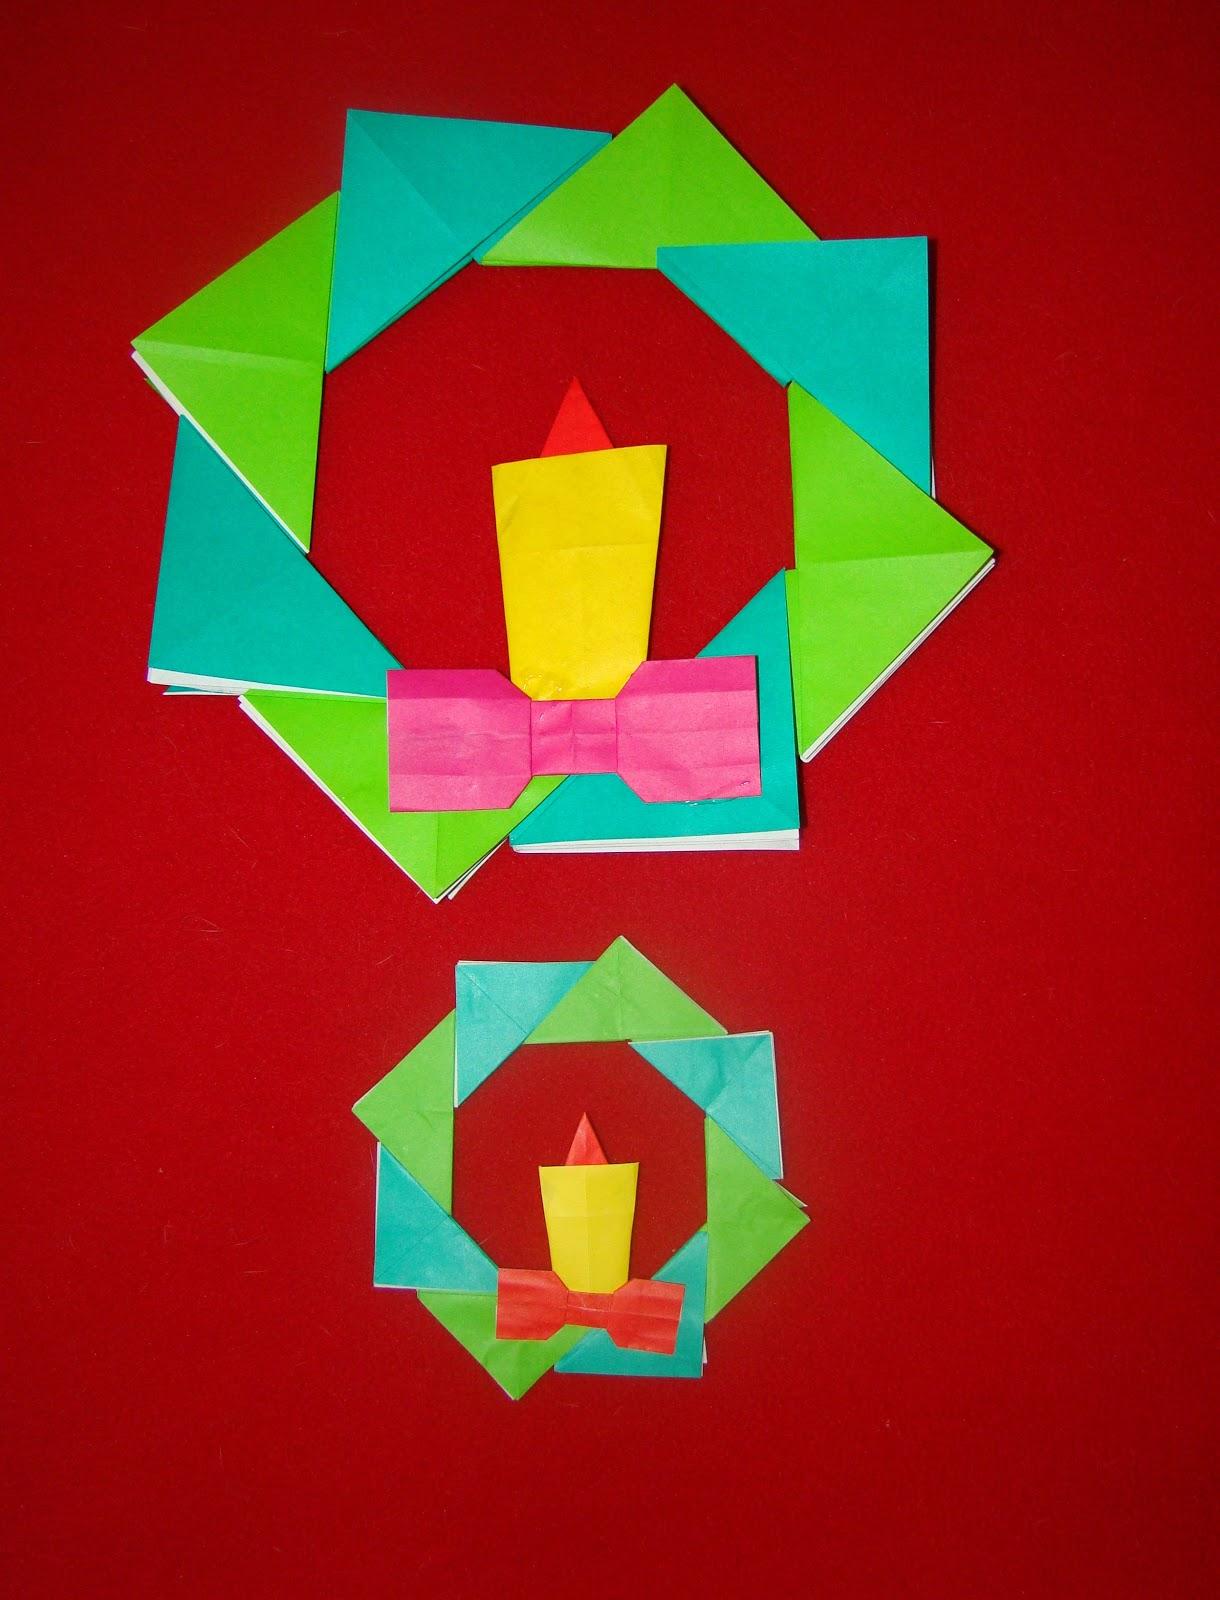 christmas origami diagram 4 prong generator plug wiring maniacs wreath